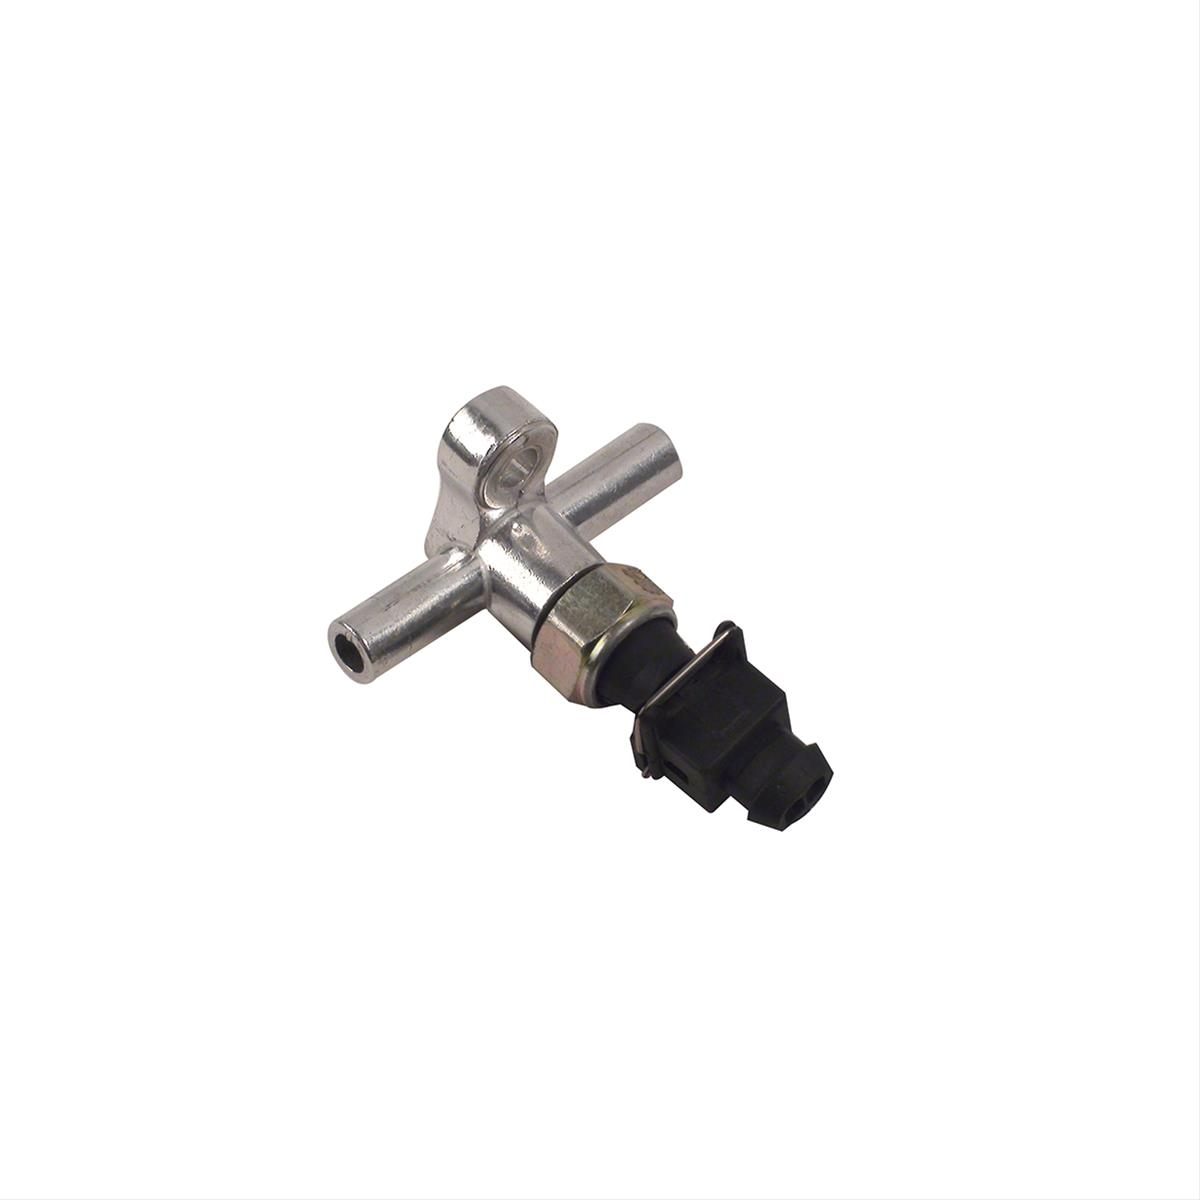 ssb 28146sw_xl ssbc replacement vacuum pump control modules 28146sw free ssbc vacuum pump wiring diagram at n-0.co